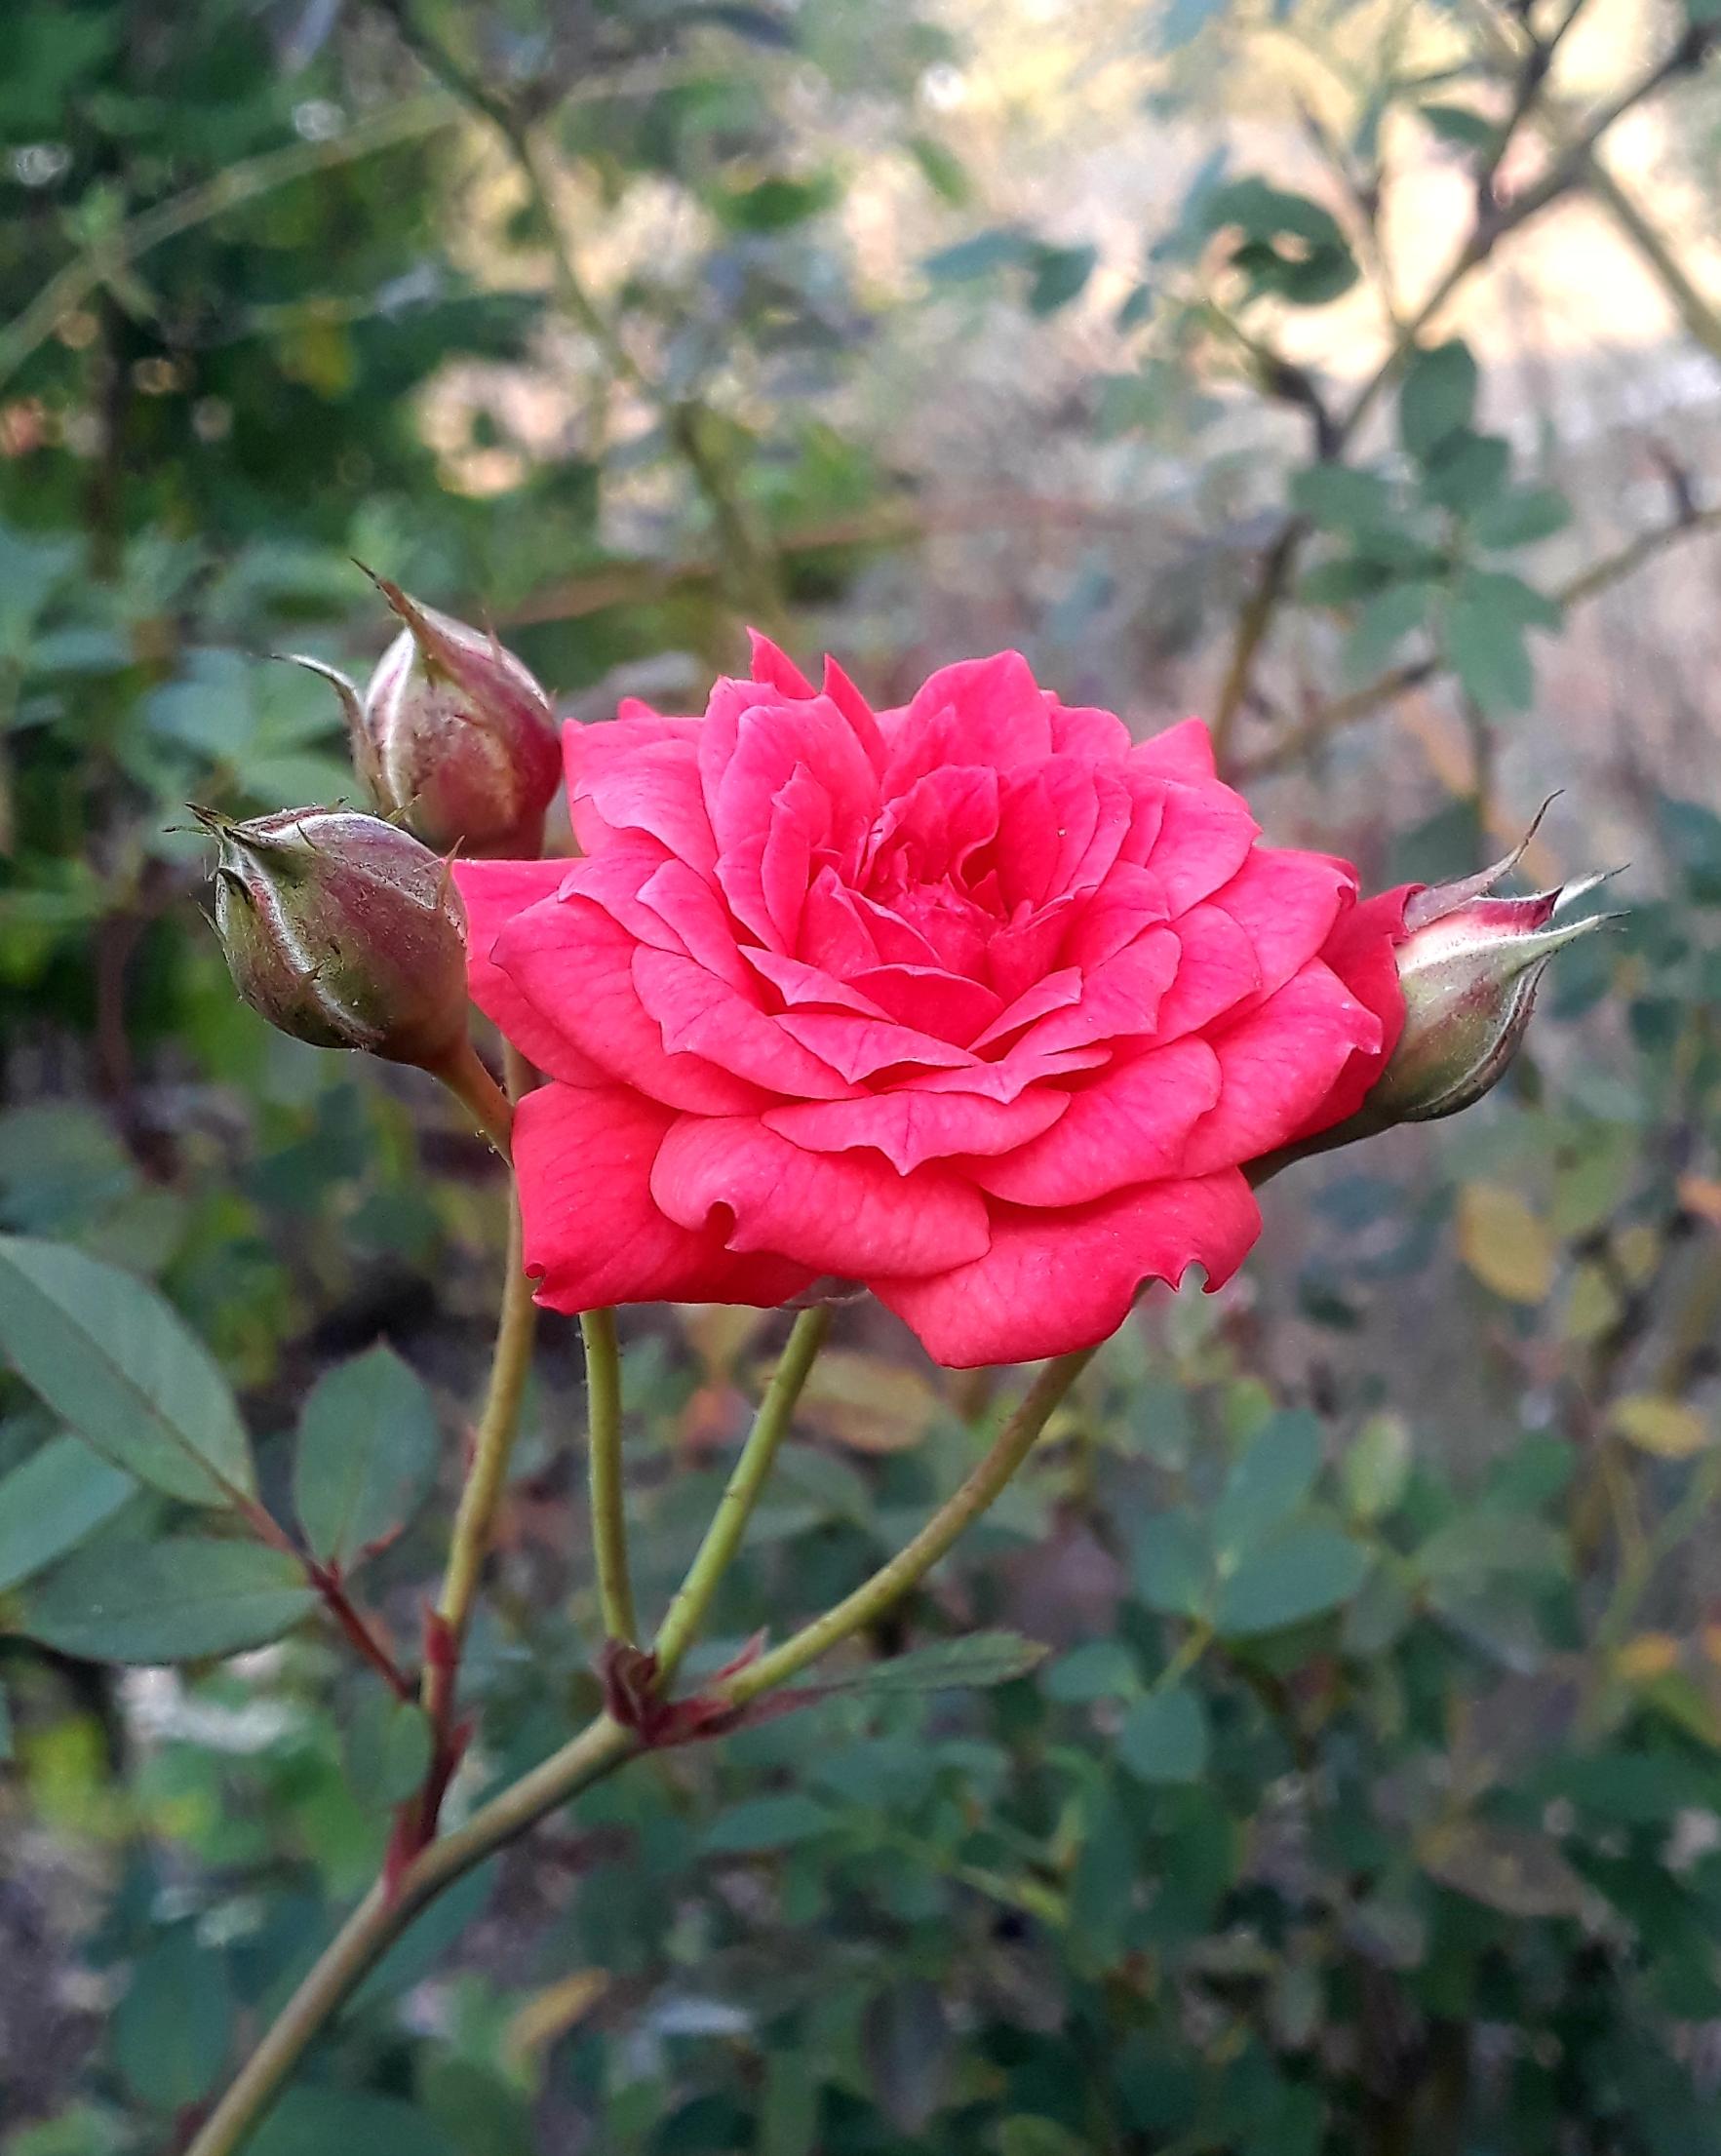 Rose flower on plant